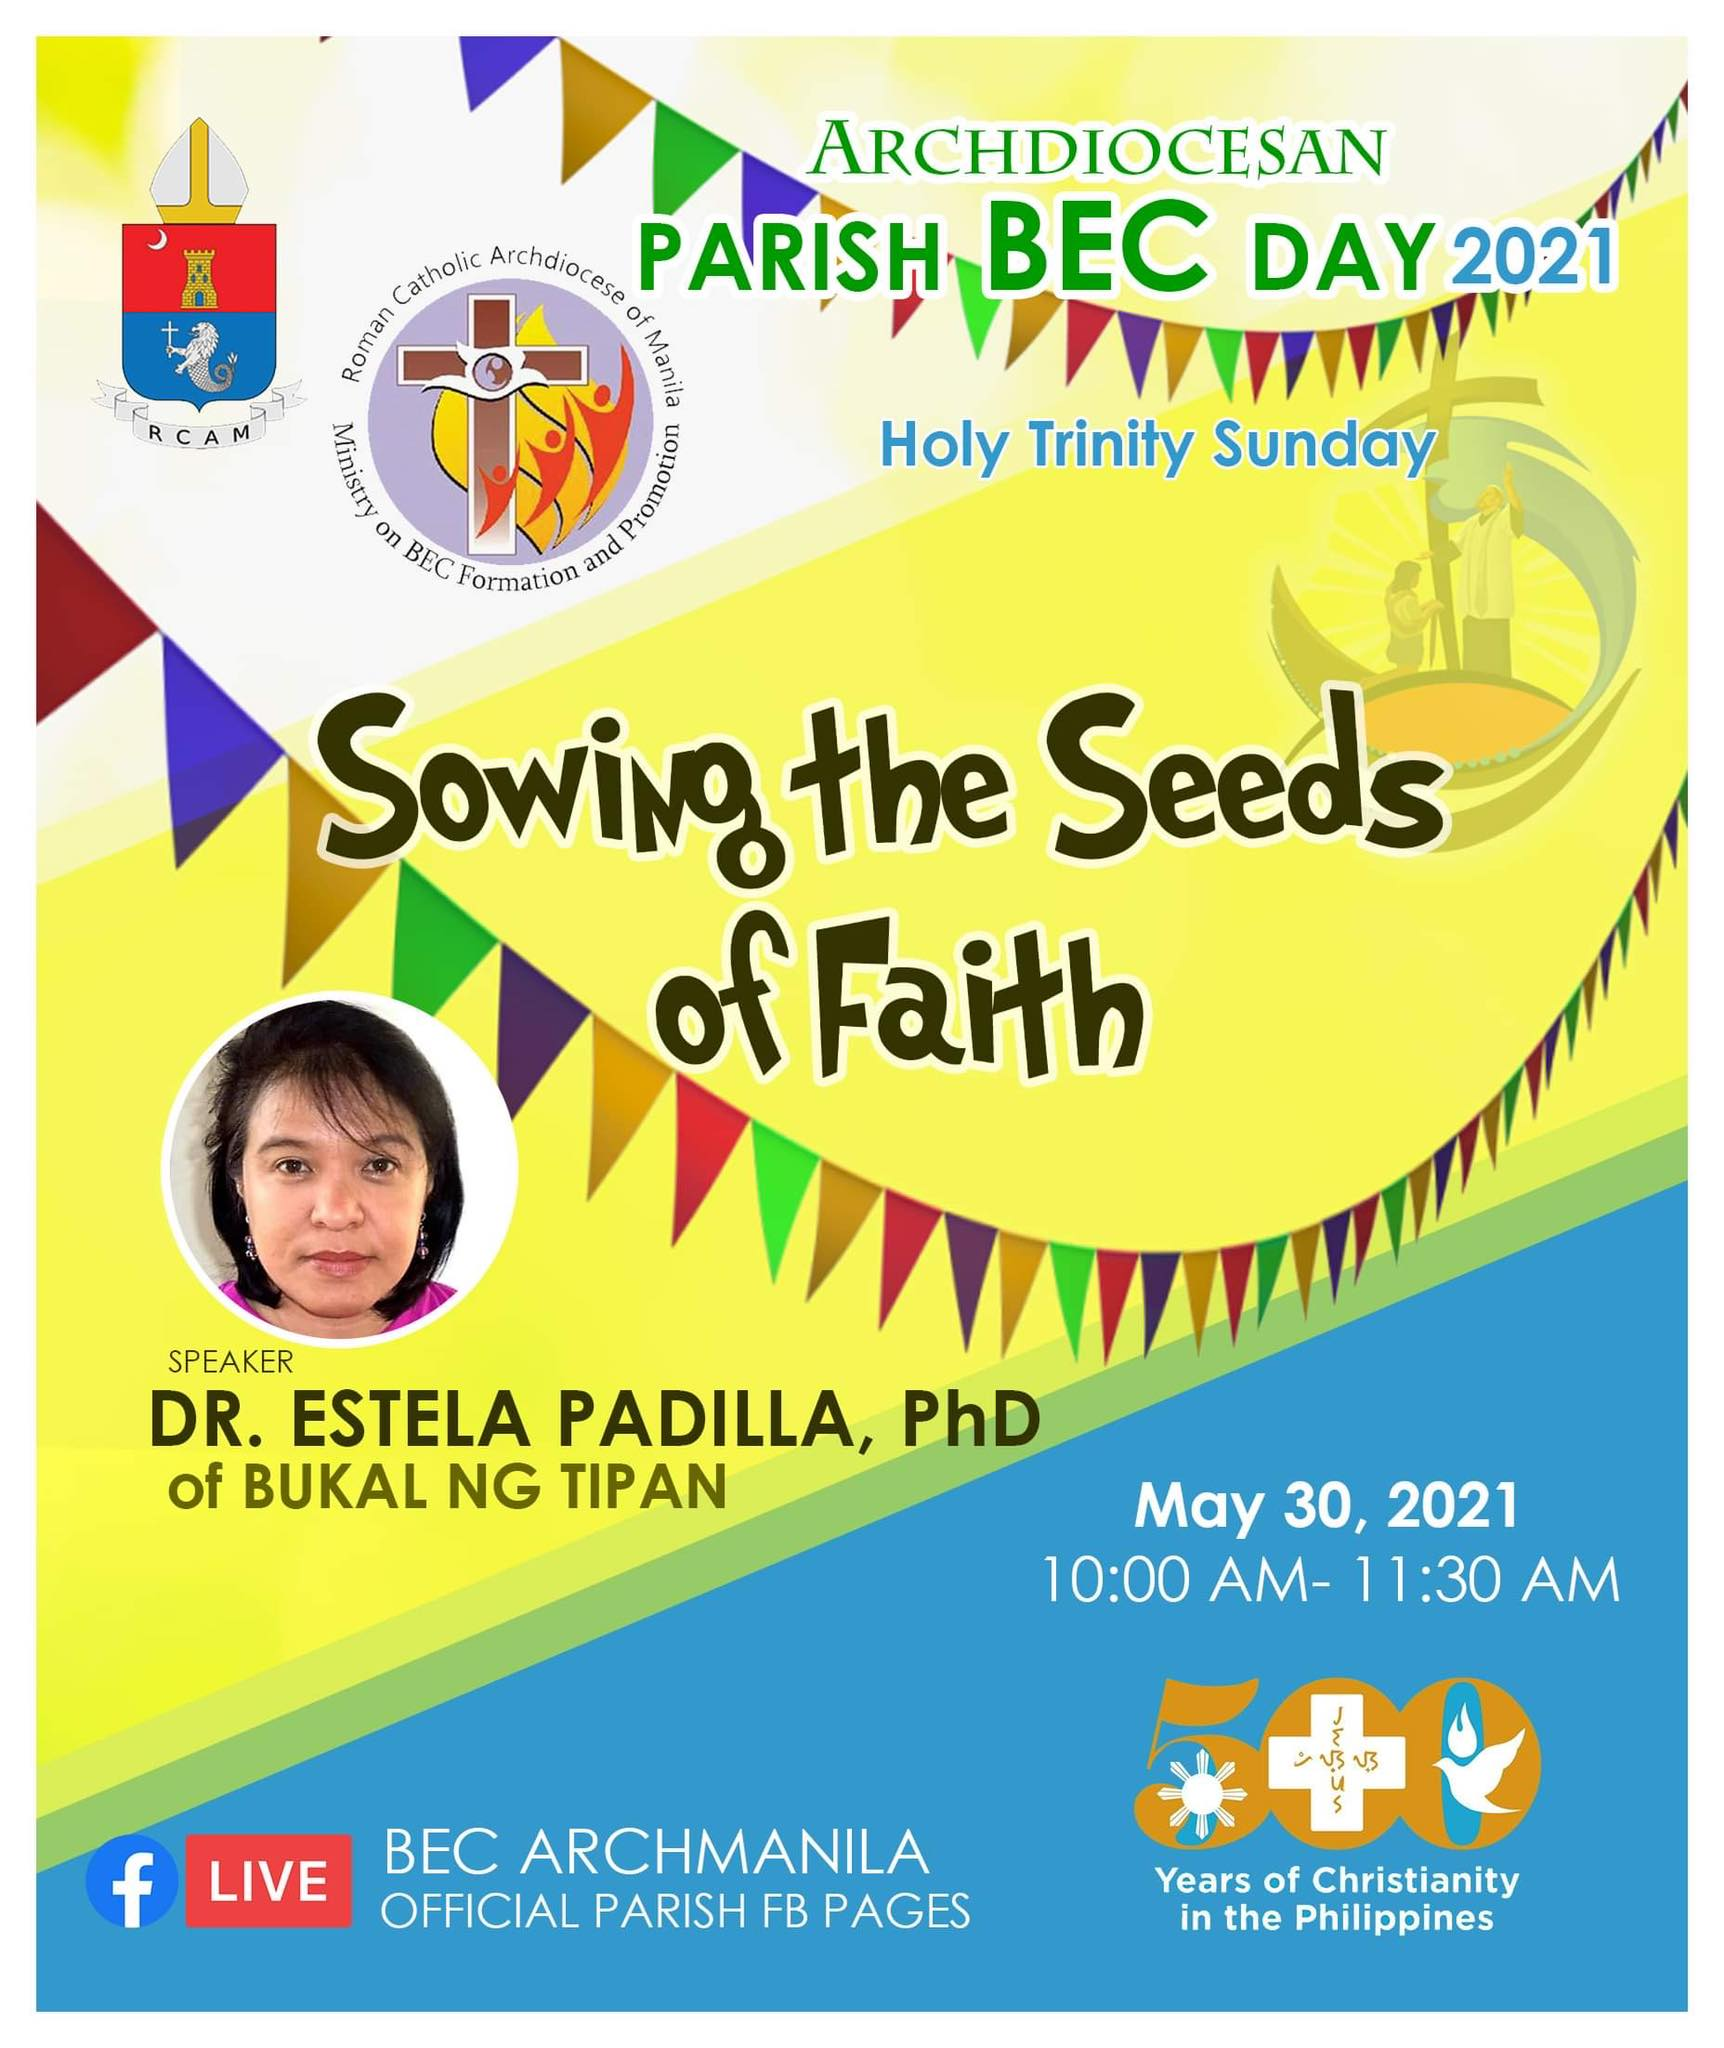 Archdiocesan Parish BEC Day 2021